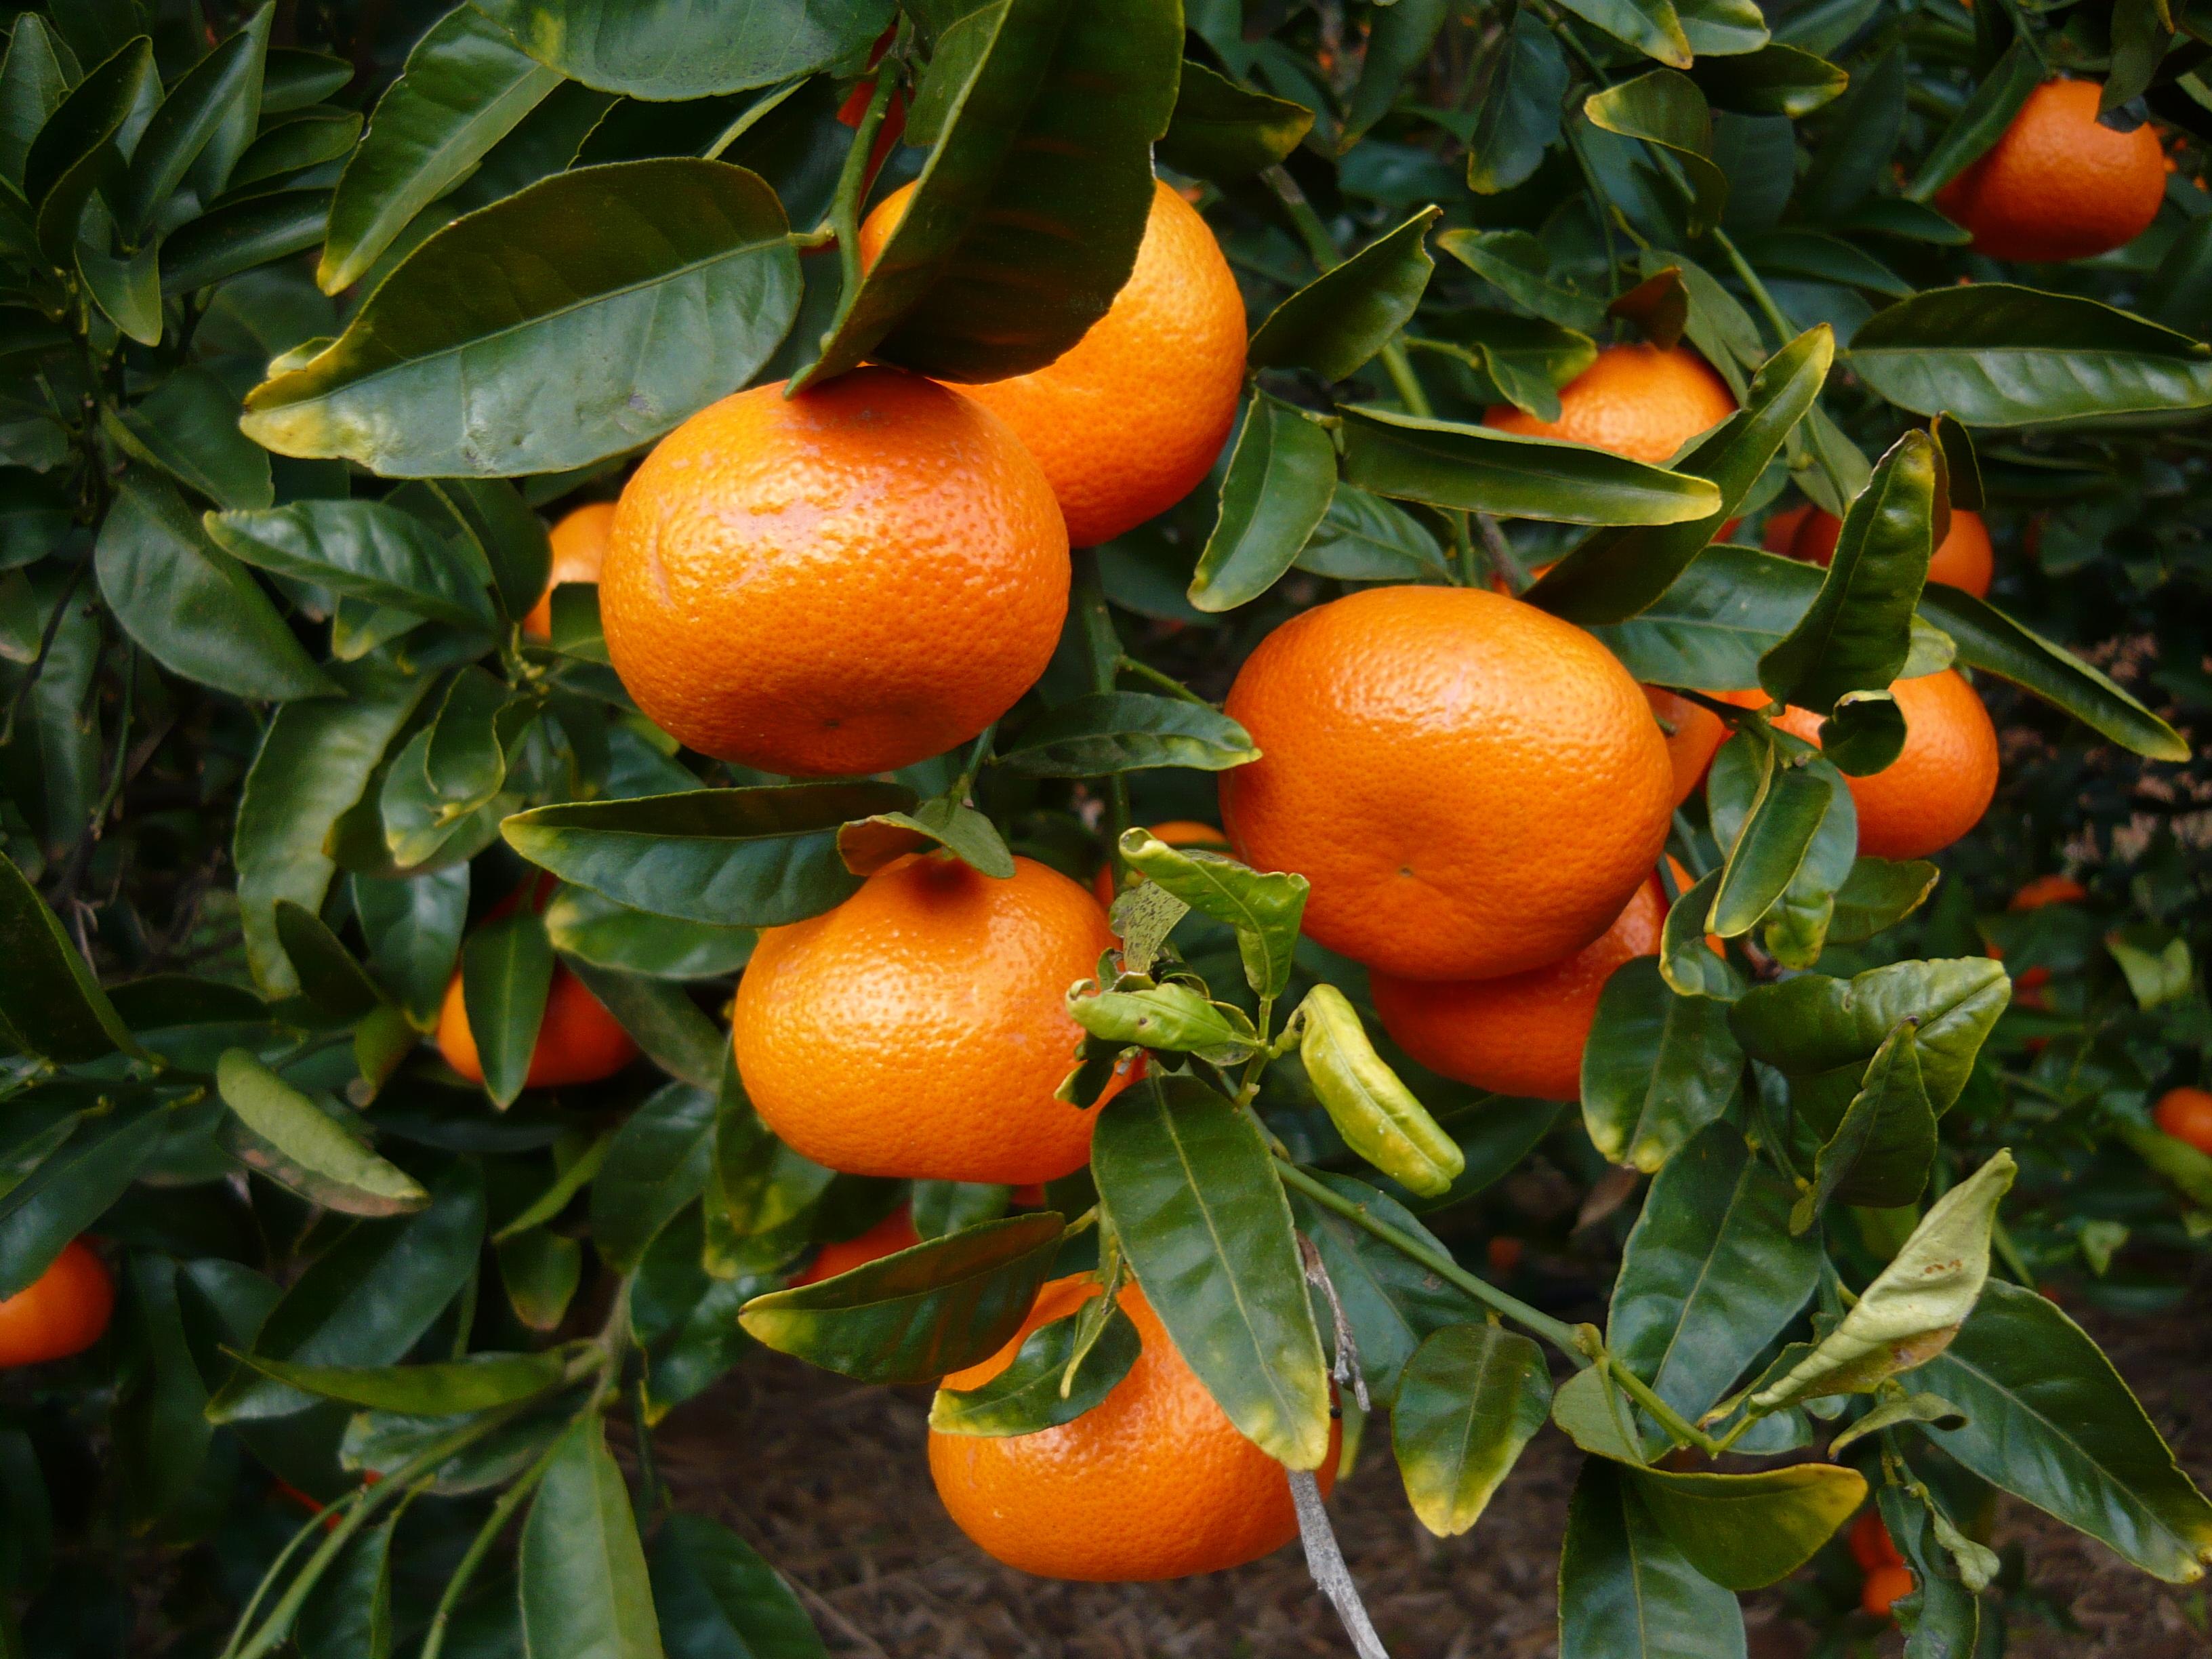 A smooth navel orange